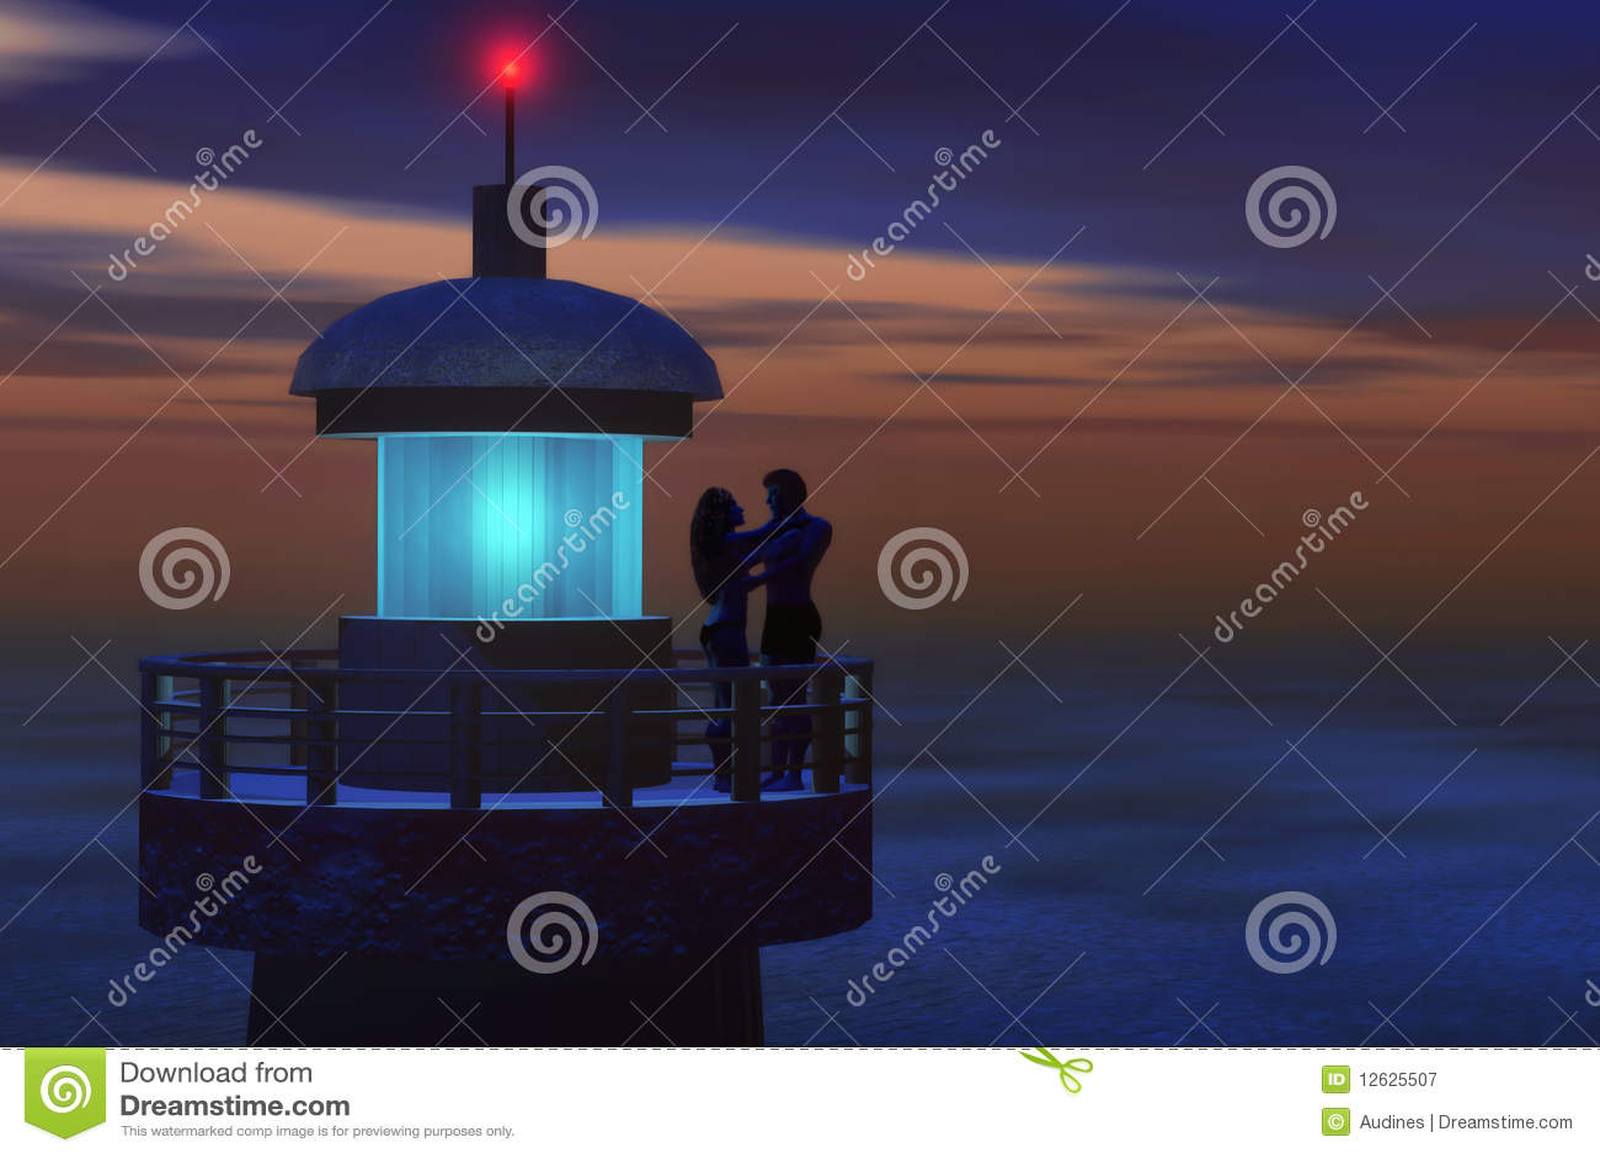 Romantic lighthouse